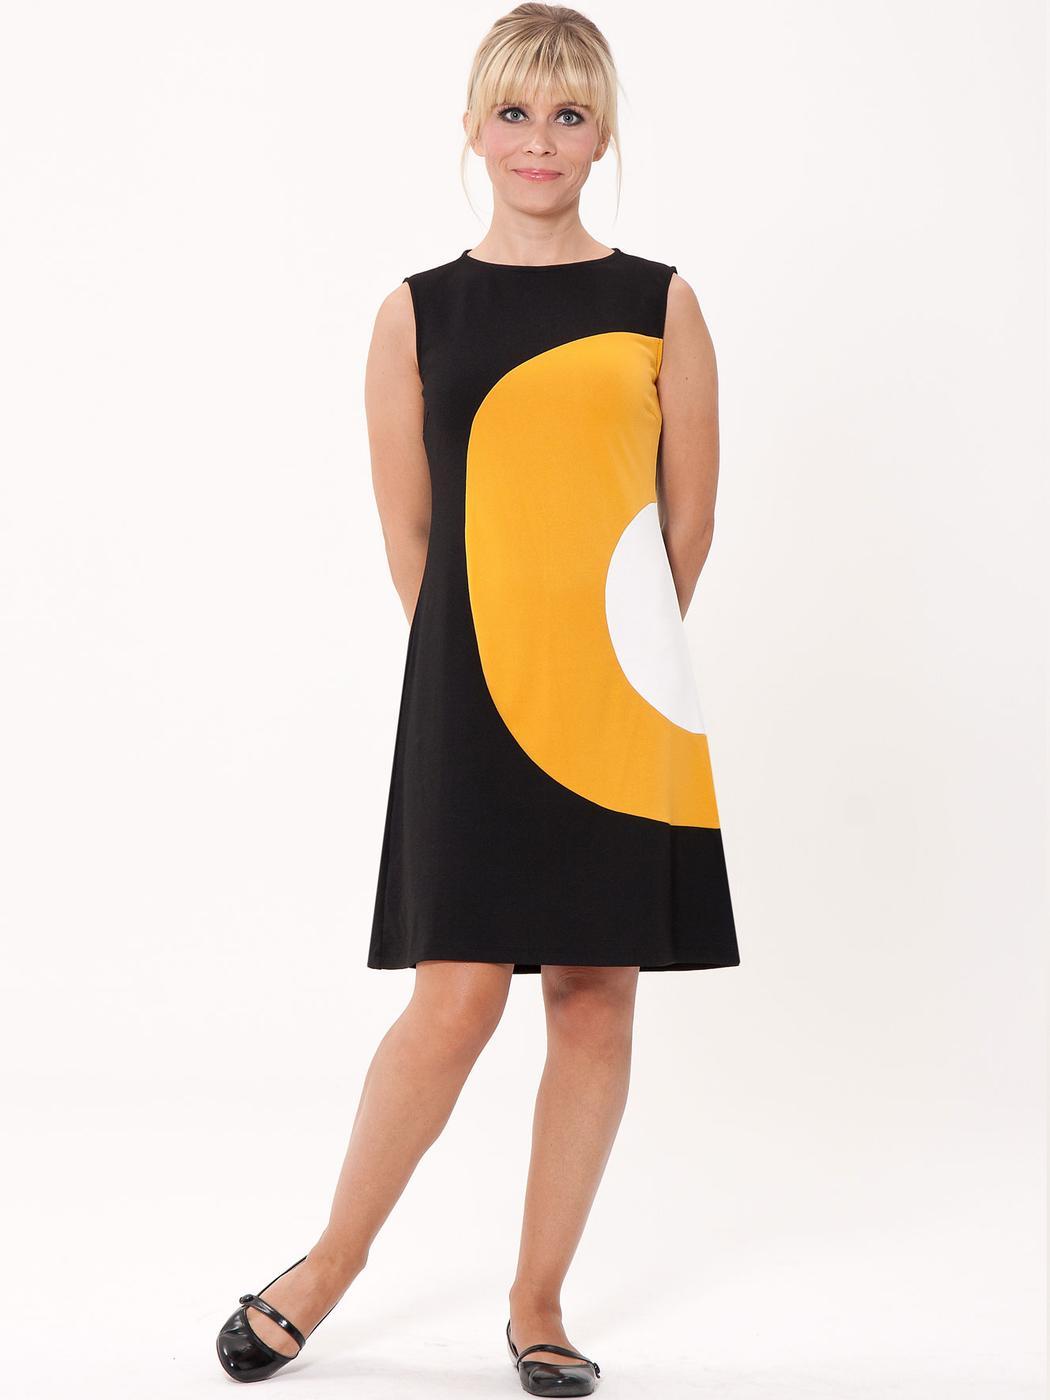 mademoiselle yeye peggy retro 60s mod target a line dress